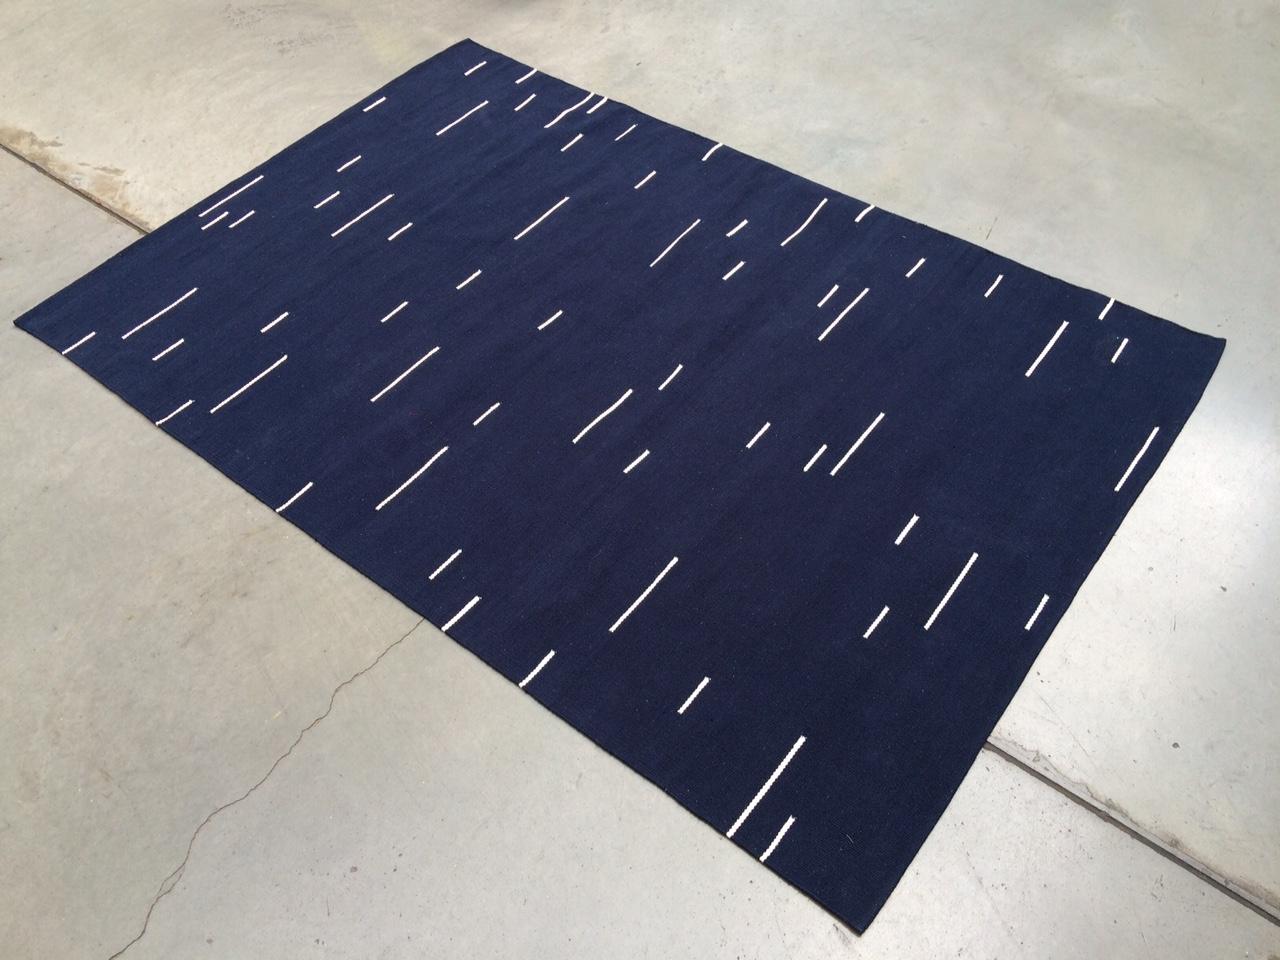 Jama-khan rug in blue - 120 x 180 cms 100% handwoven cotton